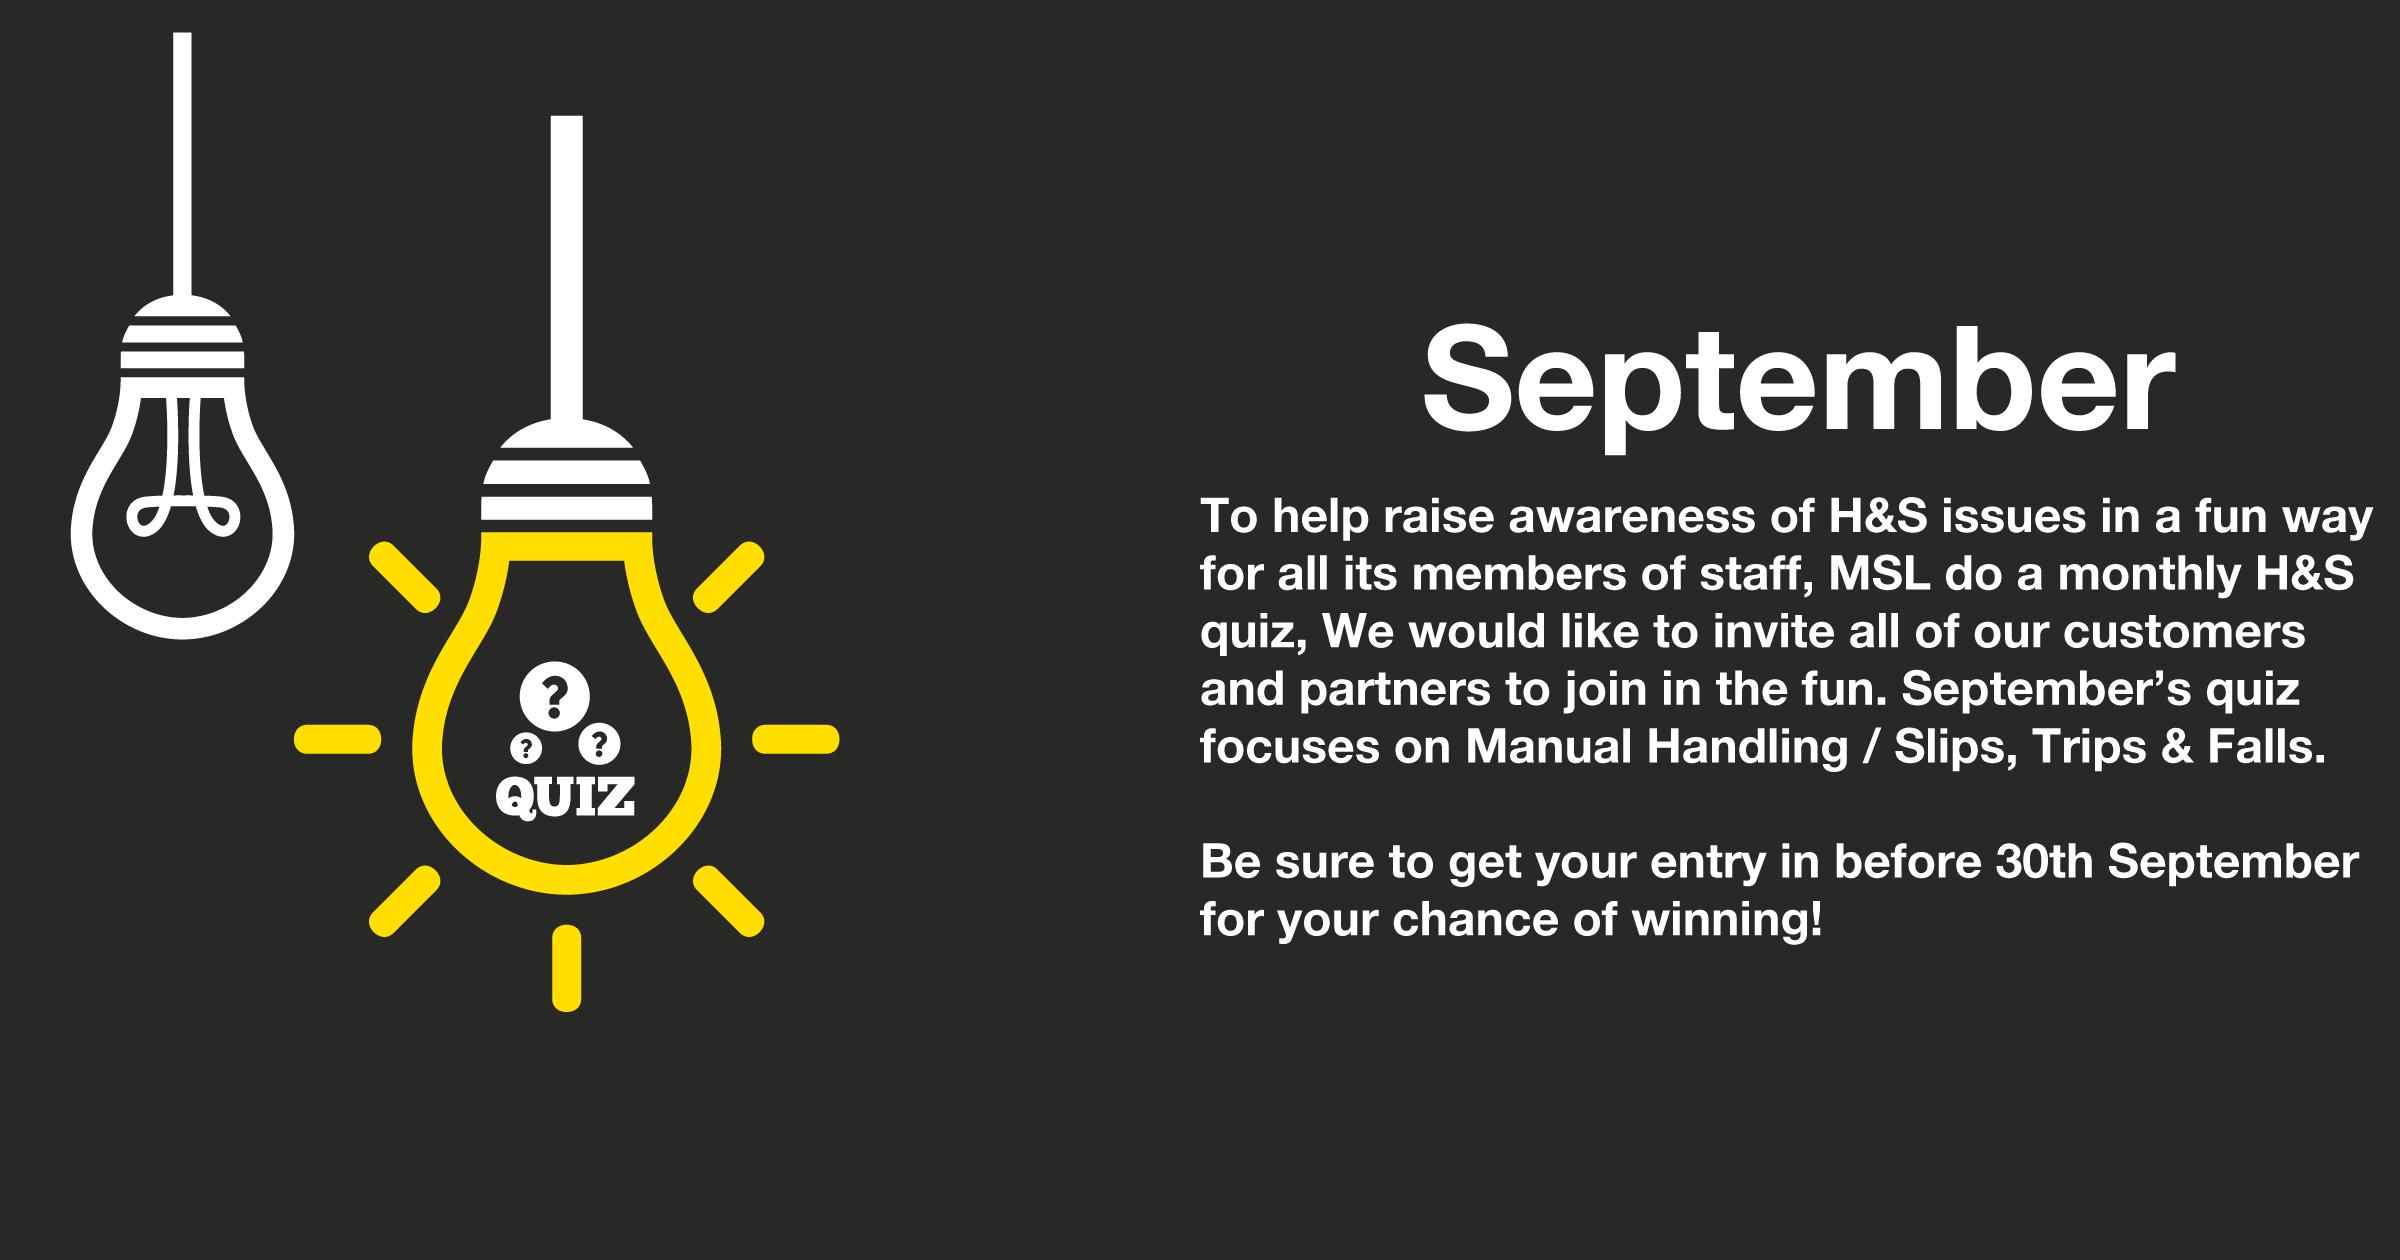 September 2016 H&S Quiz Closing Soon image